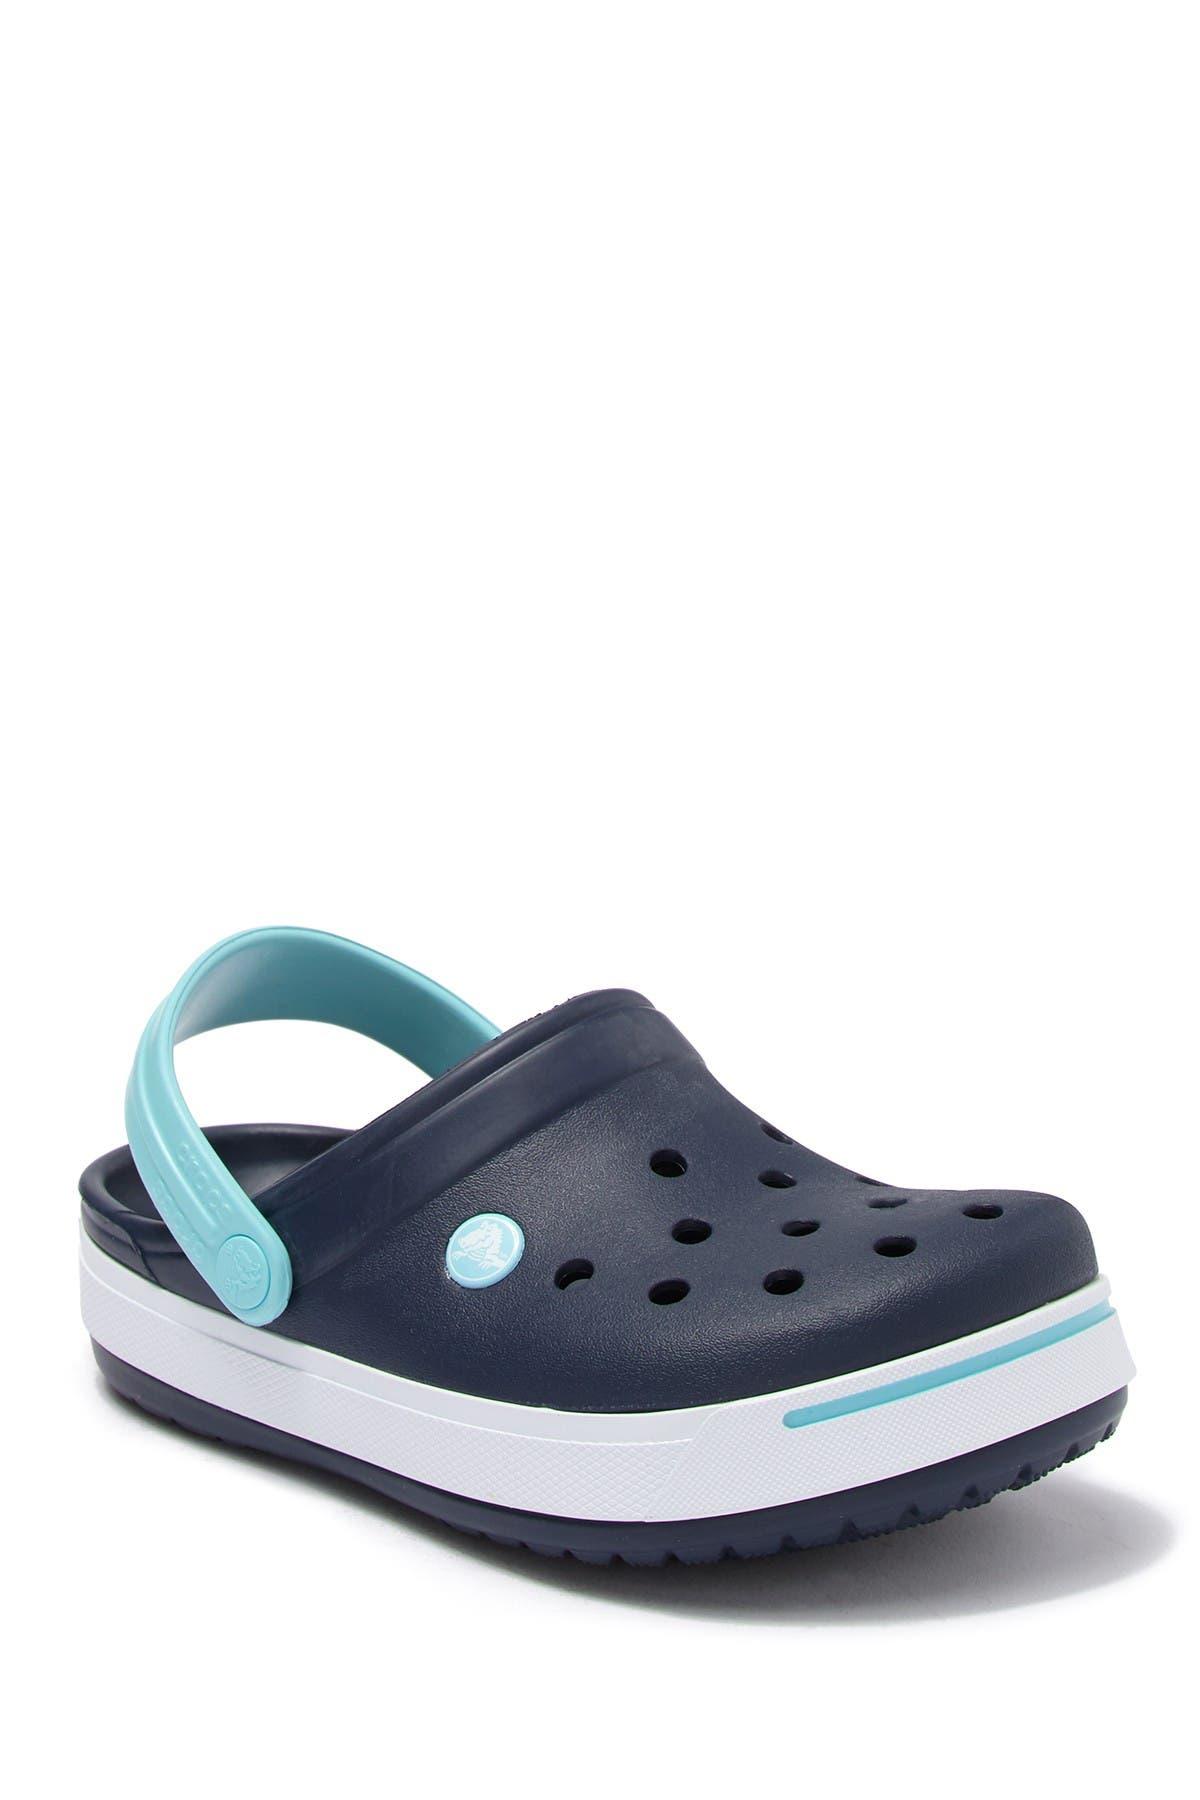 Image of Crocs Crocband II Clog